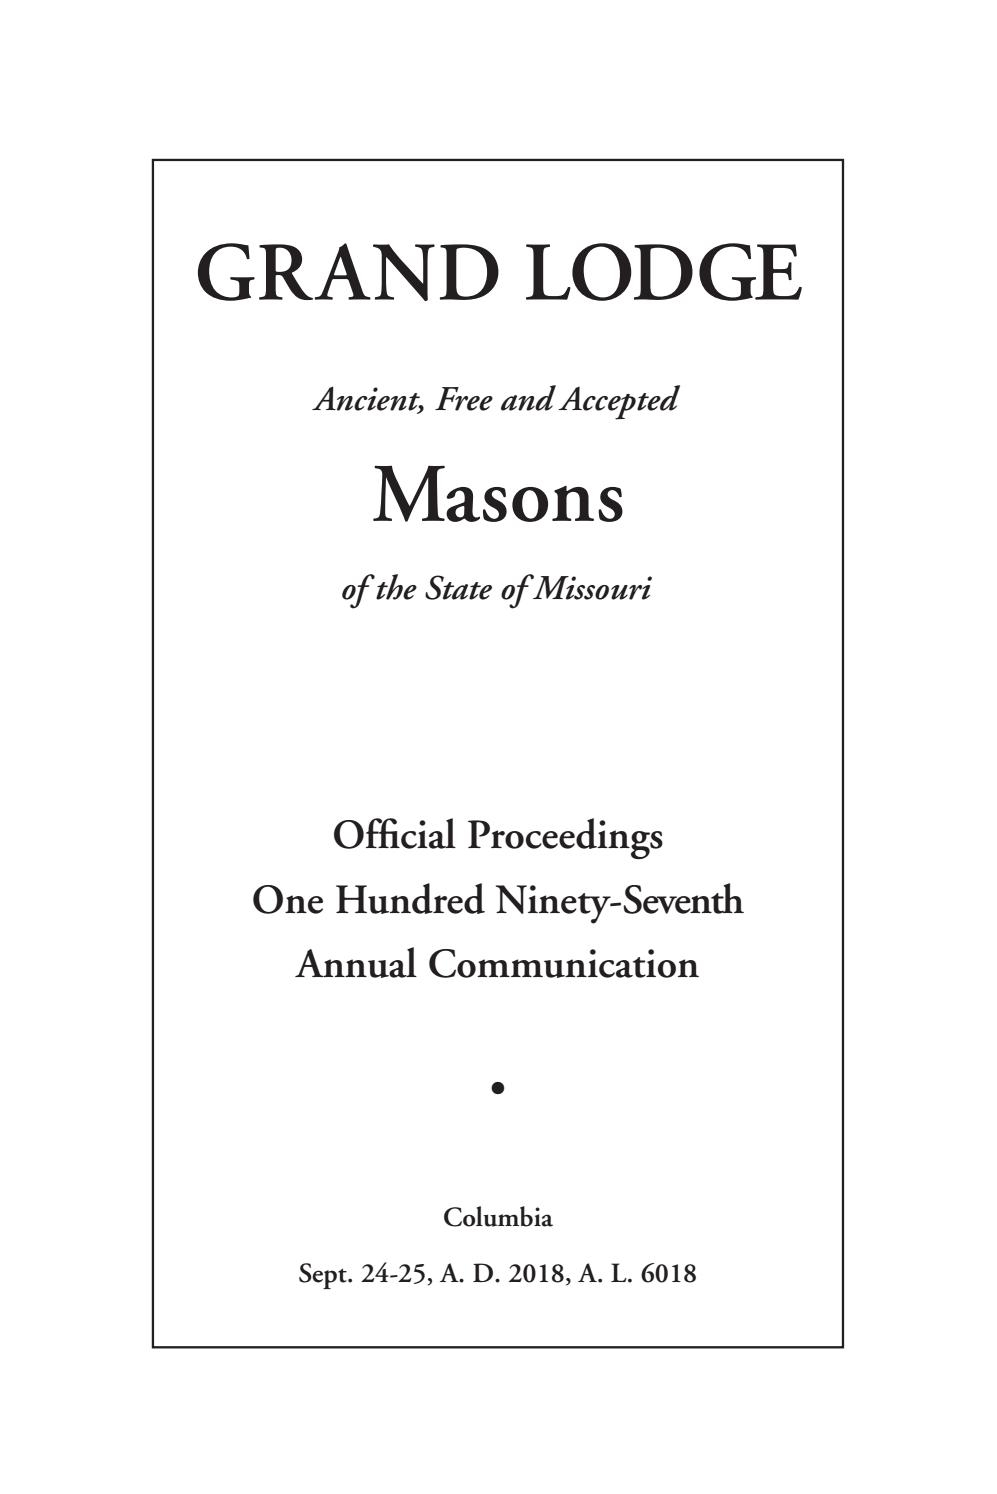 Official Proceedings - Grand Lodge Mo Annual Communication Throughout Chula Vista High School District Calendar 2021 20